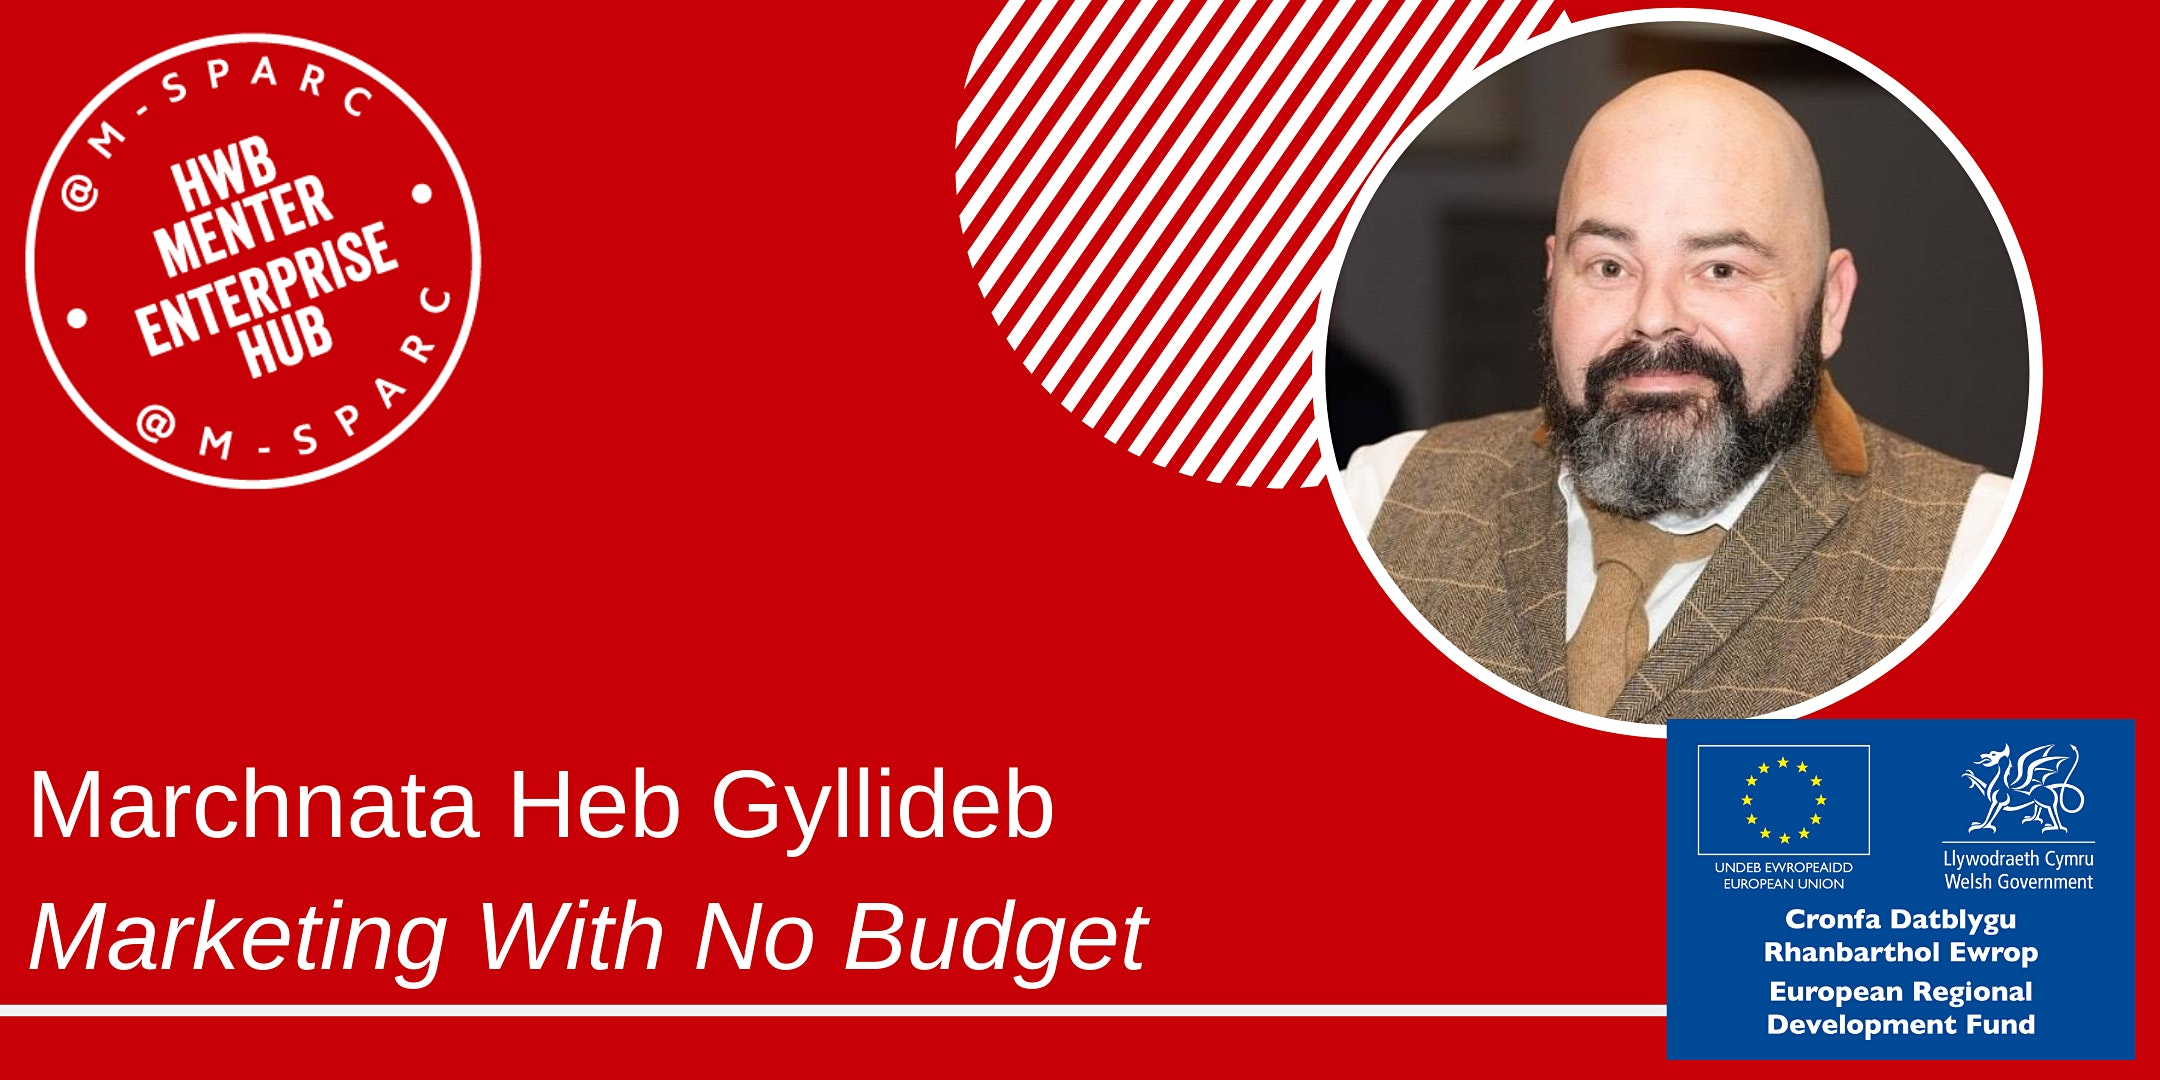 Covid-19: Marchnata Heb Gyllideb / Marketing With No Budget